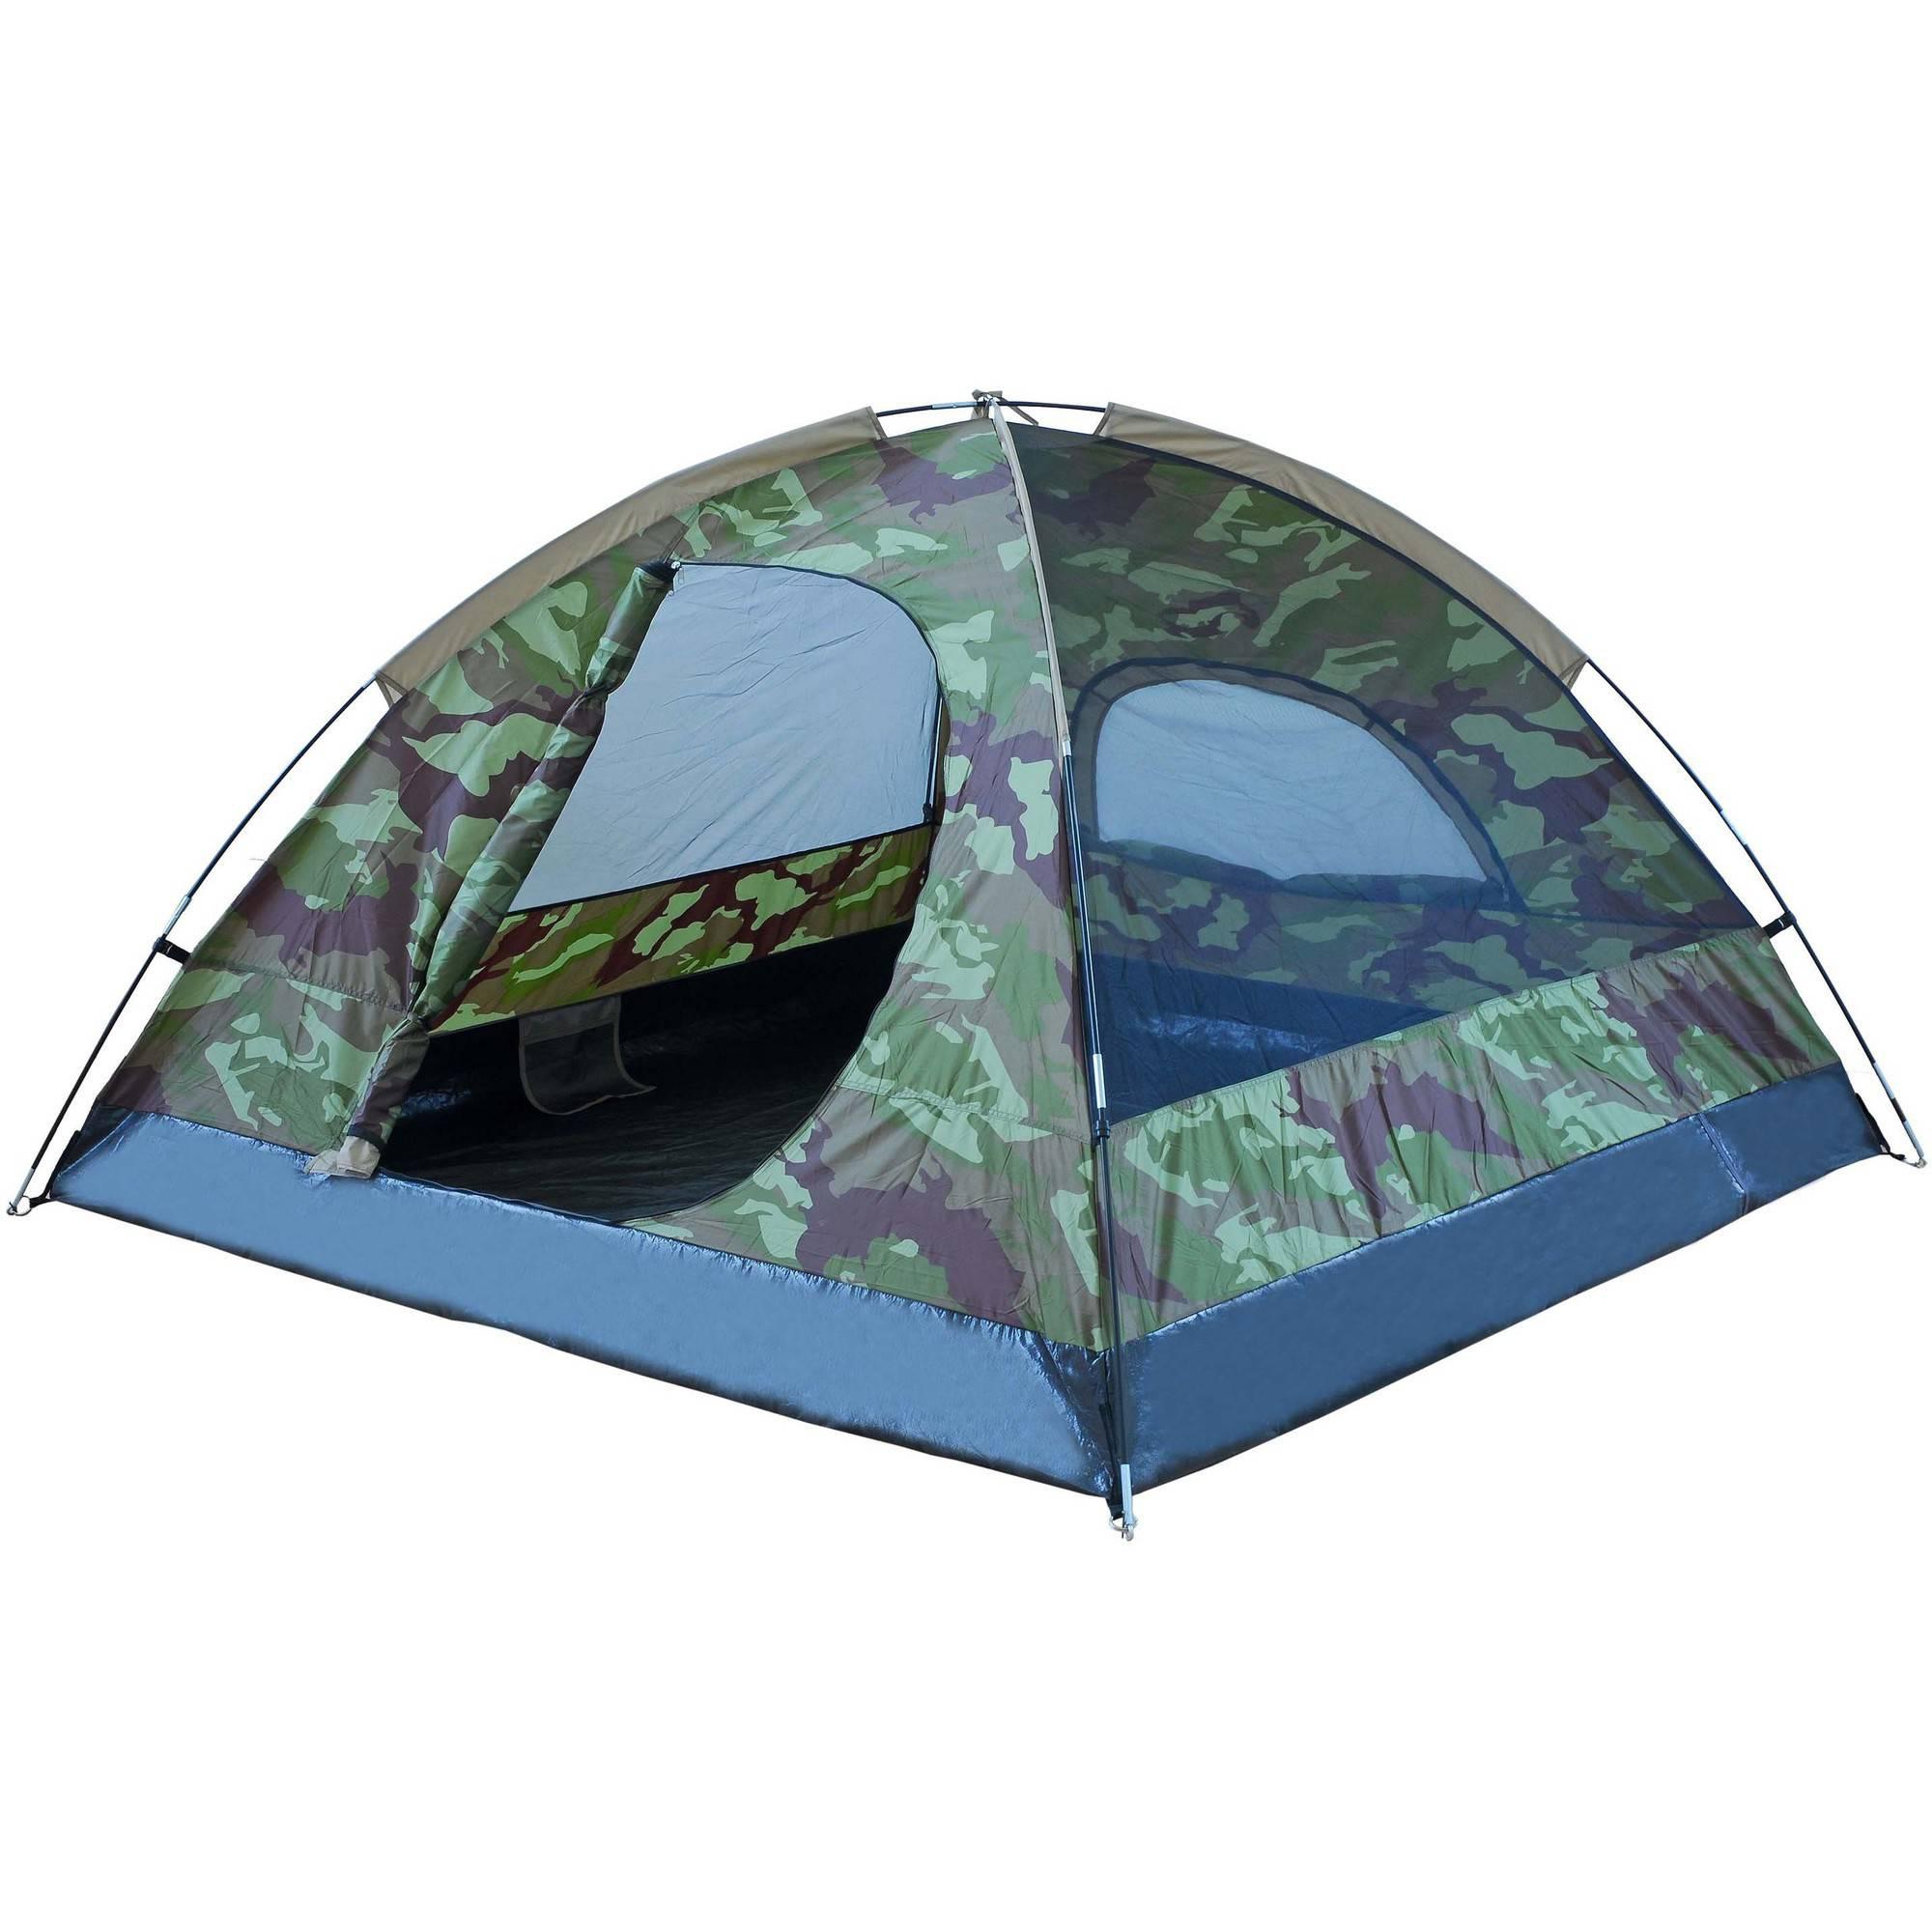 Redleg 3 Tent